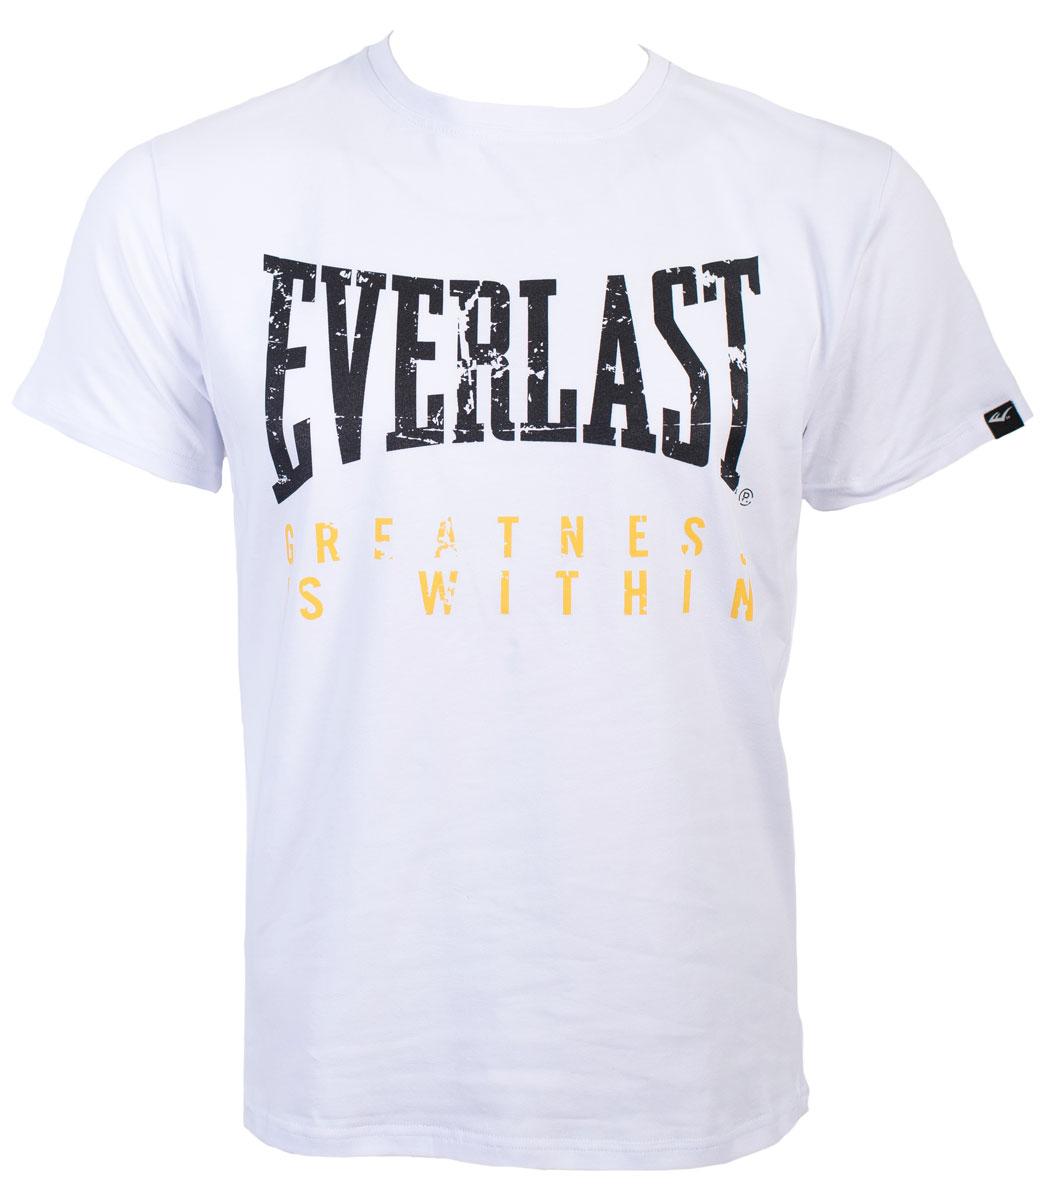 Футболка мужская Everlast Greatness, цвет: белый. RE0035. Размер XXL (54/56) футболка мужская mitre цвет желтый tt29019 размер xxl 54 56